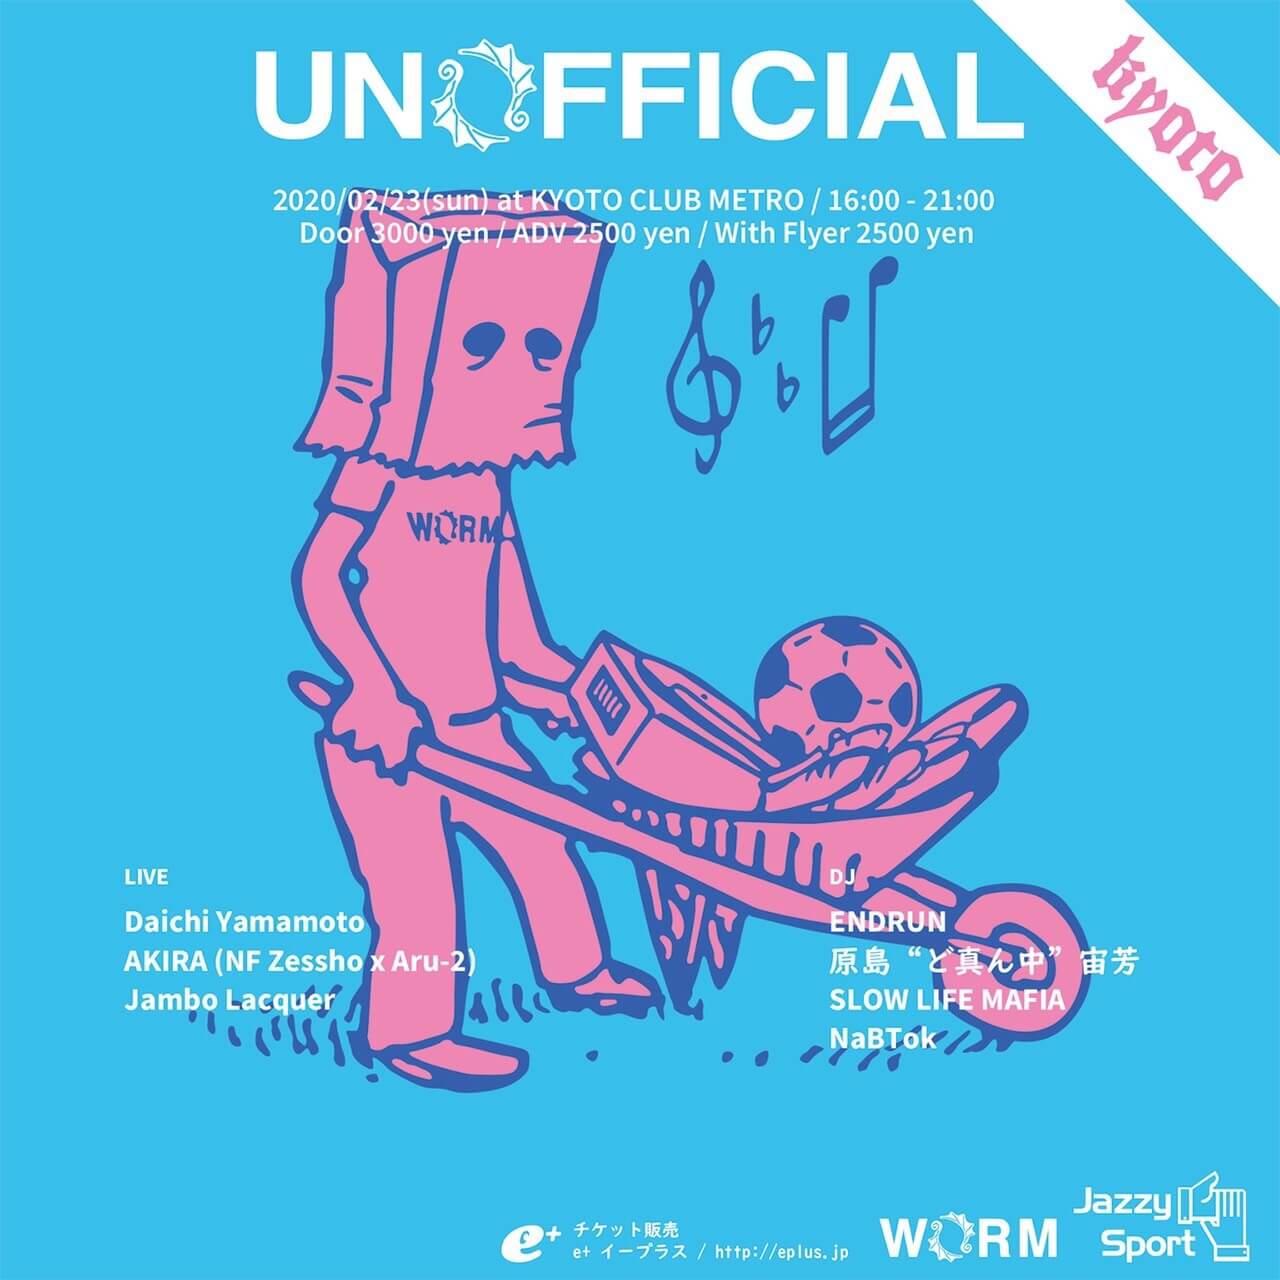 WORM TOKYO主宰「UNOFFICIAL」が東京・京都で開催|MONJU、Daichi Yamamoto、AKIRA、owls、Budamunk、NaBTokらが出演 music200216-wormtokyo-2